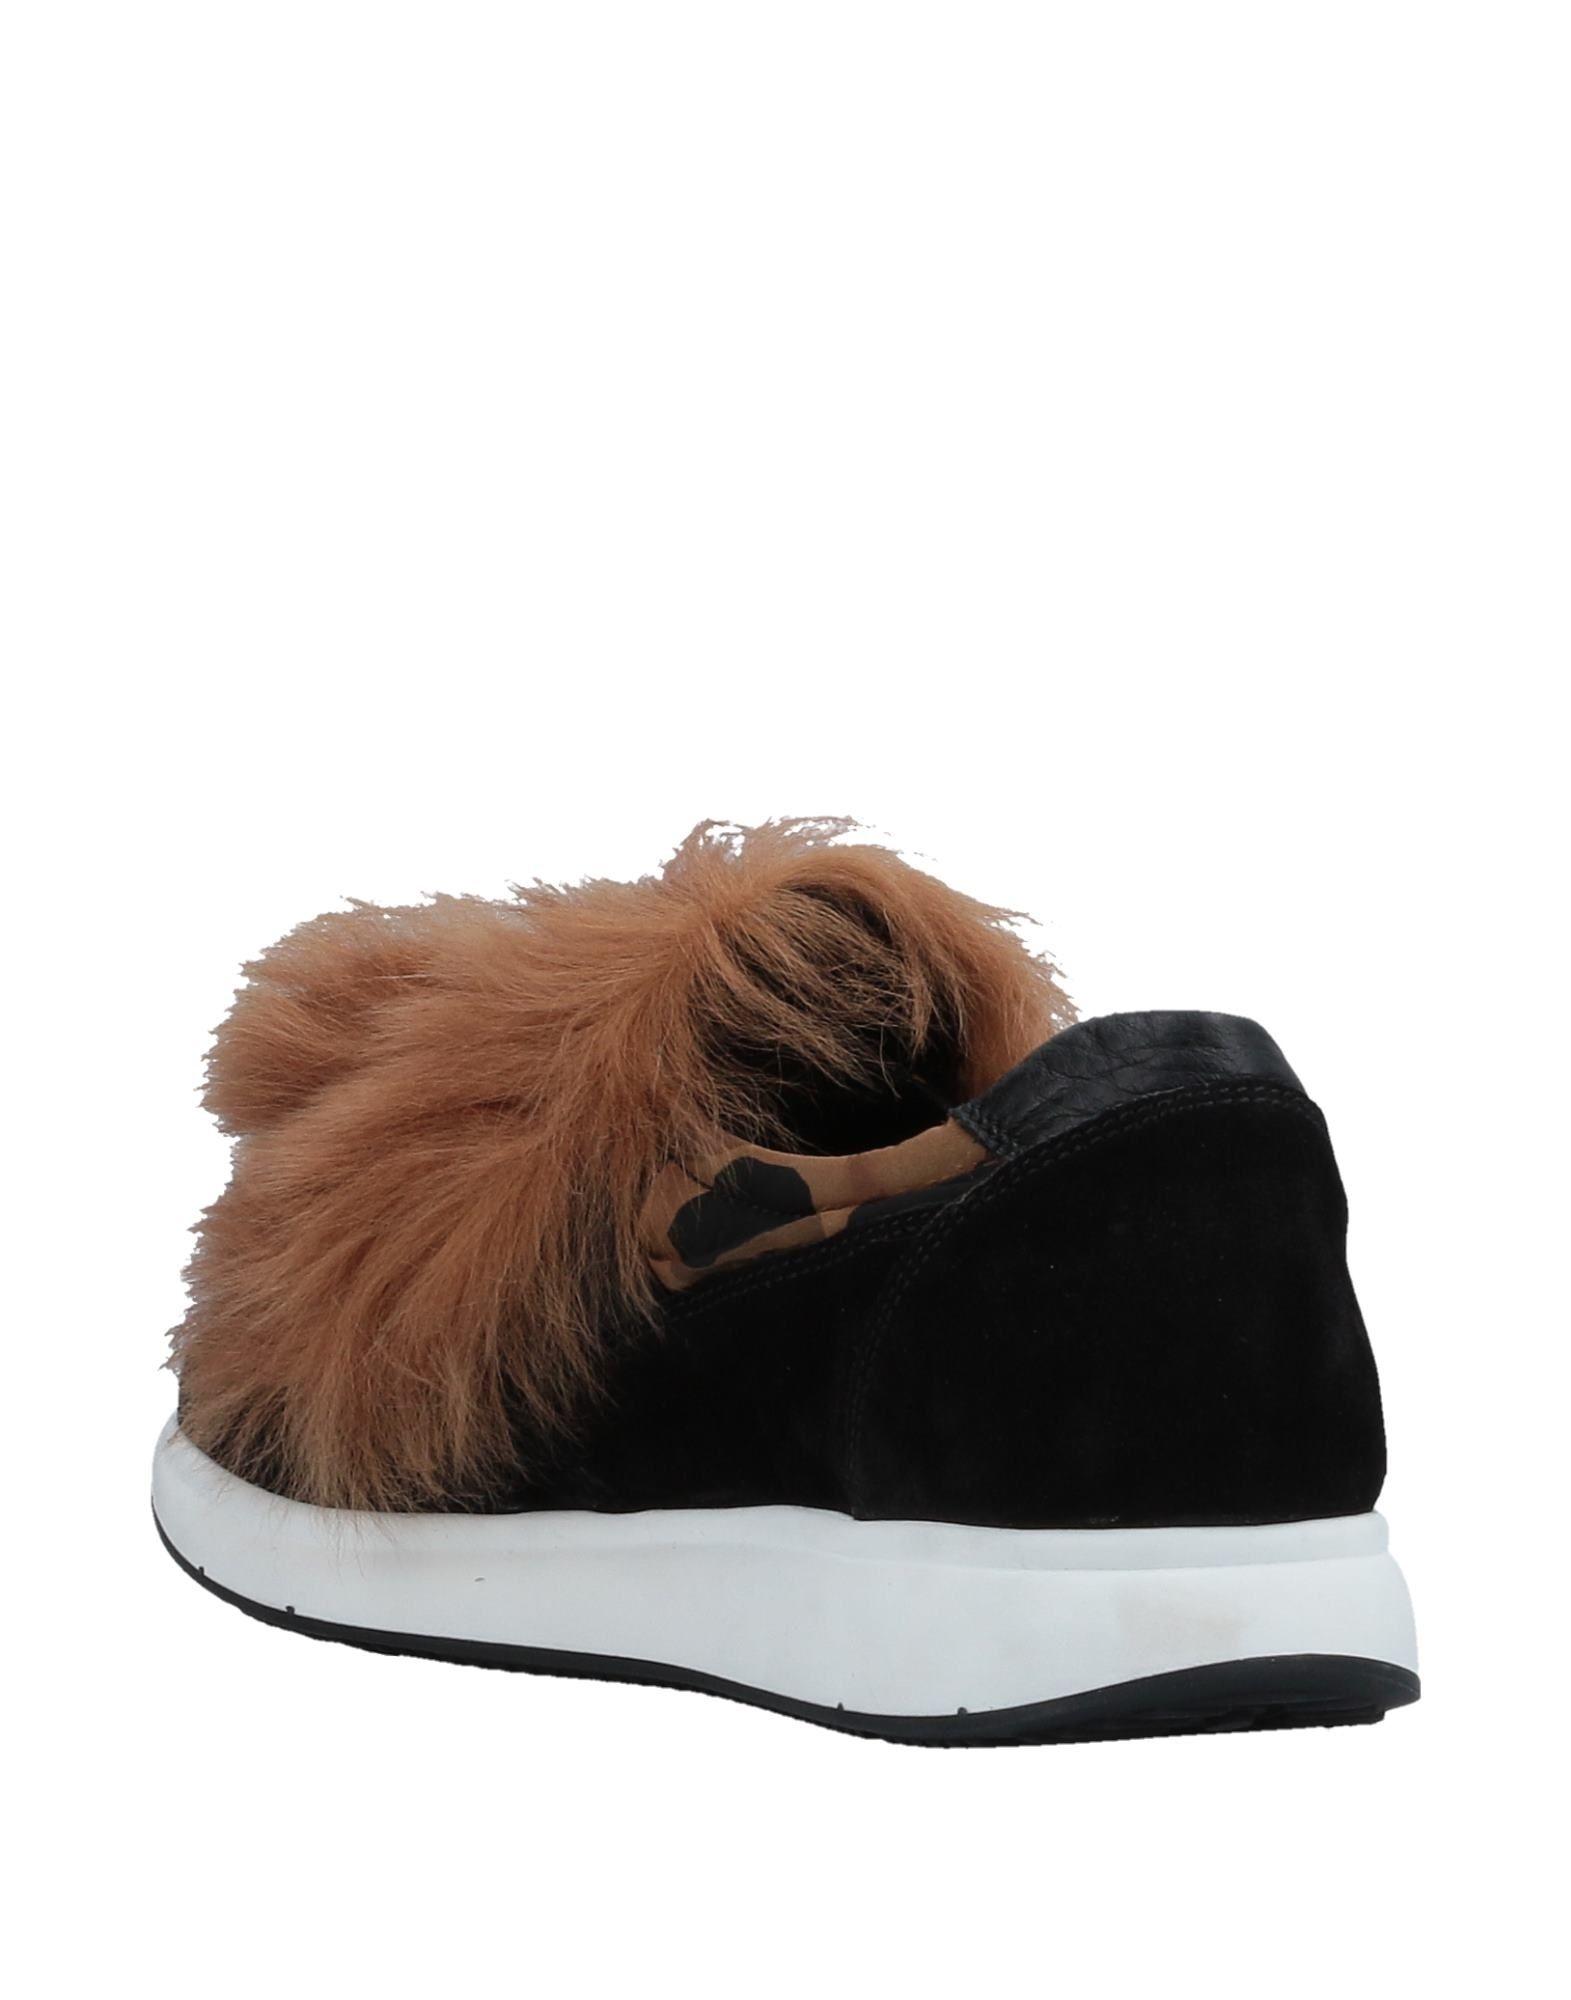 Carshoe aussehende Sneakers Damen  11507317GPGut aussehende Carshoe strapazierfähige Schuhe 832fdf